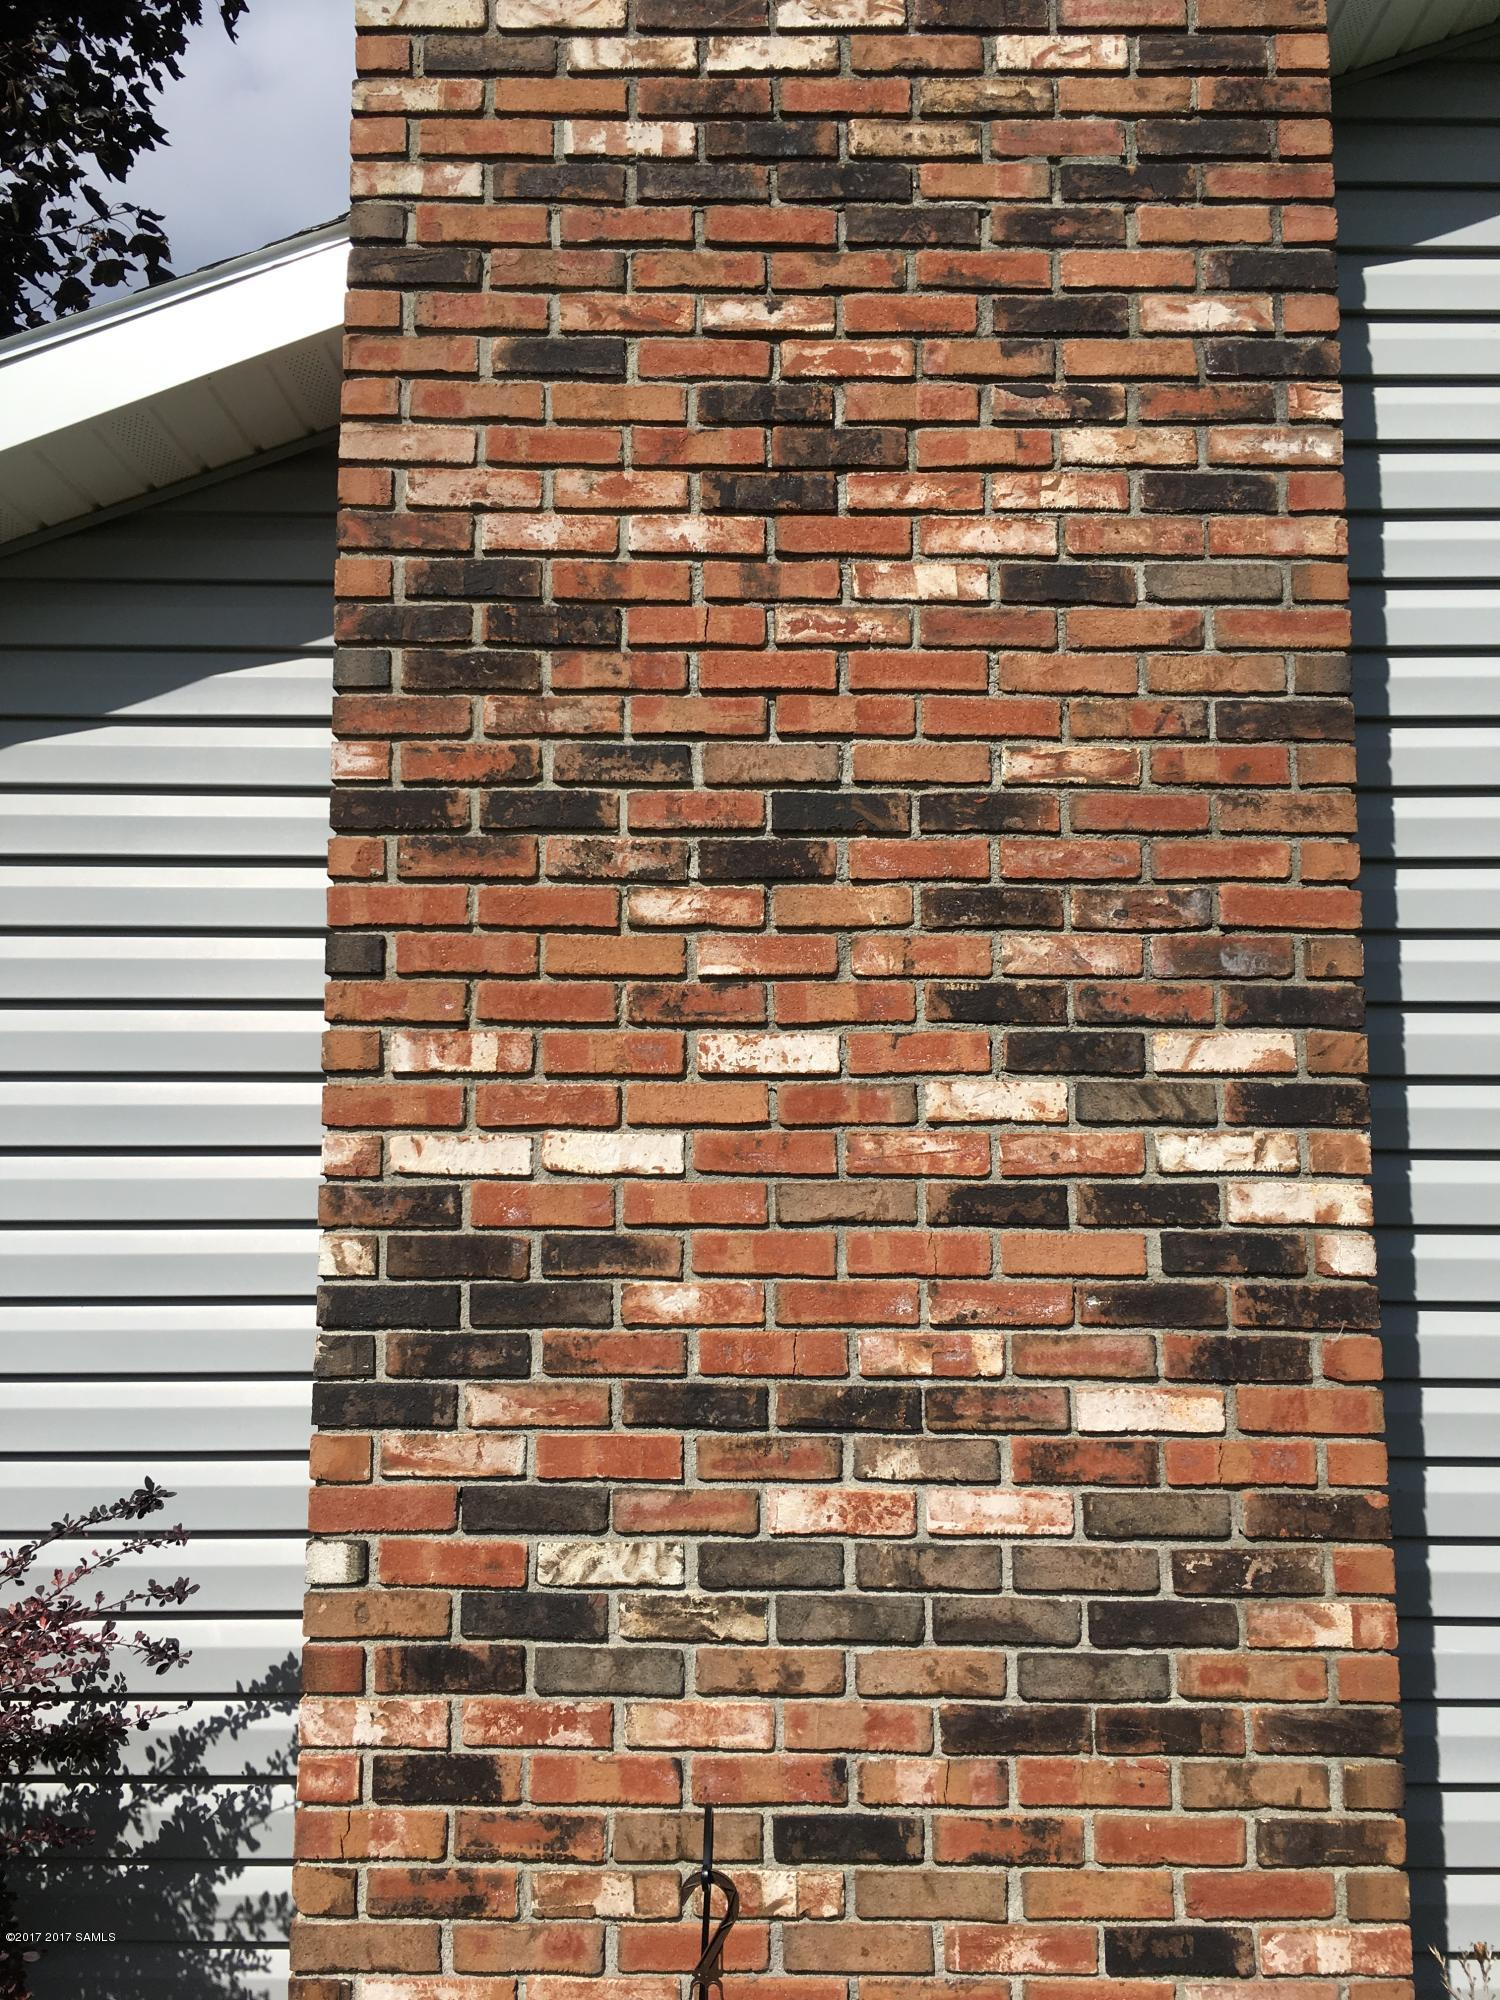 14 Frederick Drive, Fort Edward NY 12828 photo 21